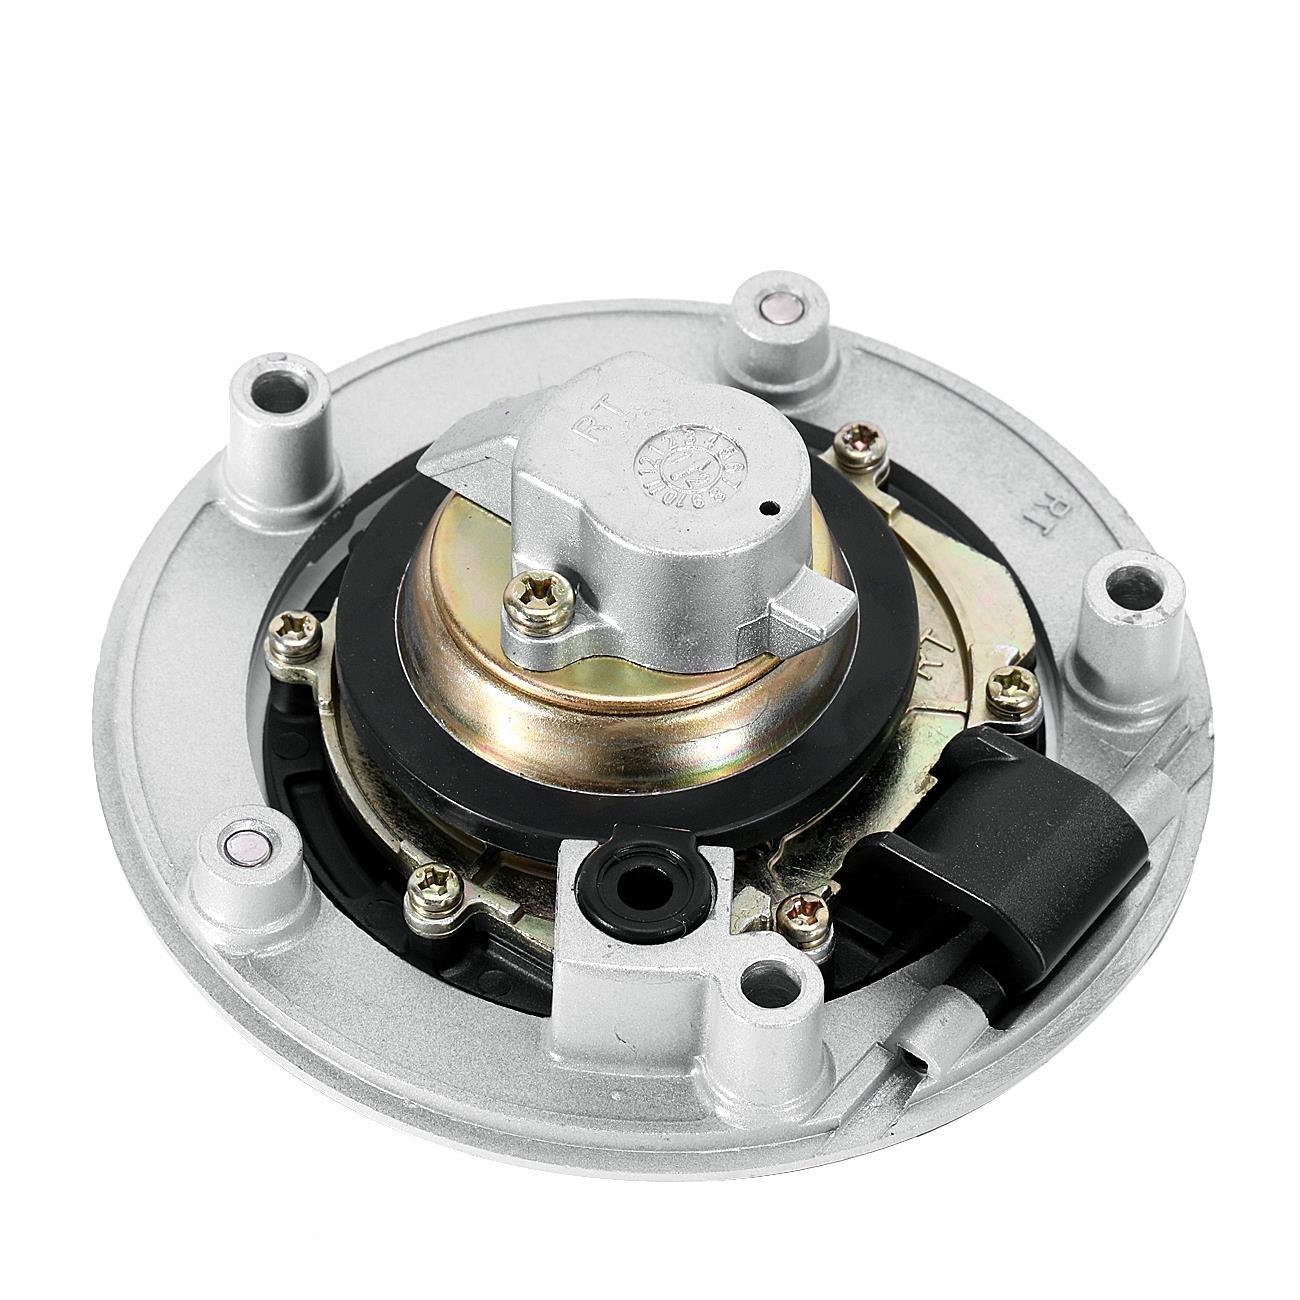 INNGLOW Motorcycle Fuel Gas Tank Cap Lock Key Cover Fits For Suzuki SV1000 650 GSF1250 GSX-R 1000 600 750 GSR 400 600 GSX 650F SFV 650 GLADIUS 2009 GSX 1250 300R HAYABUSA B-King BK1300